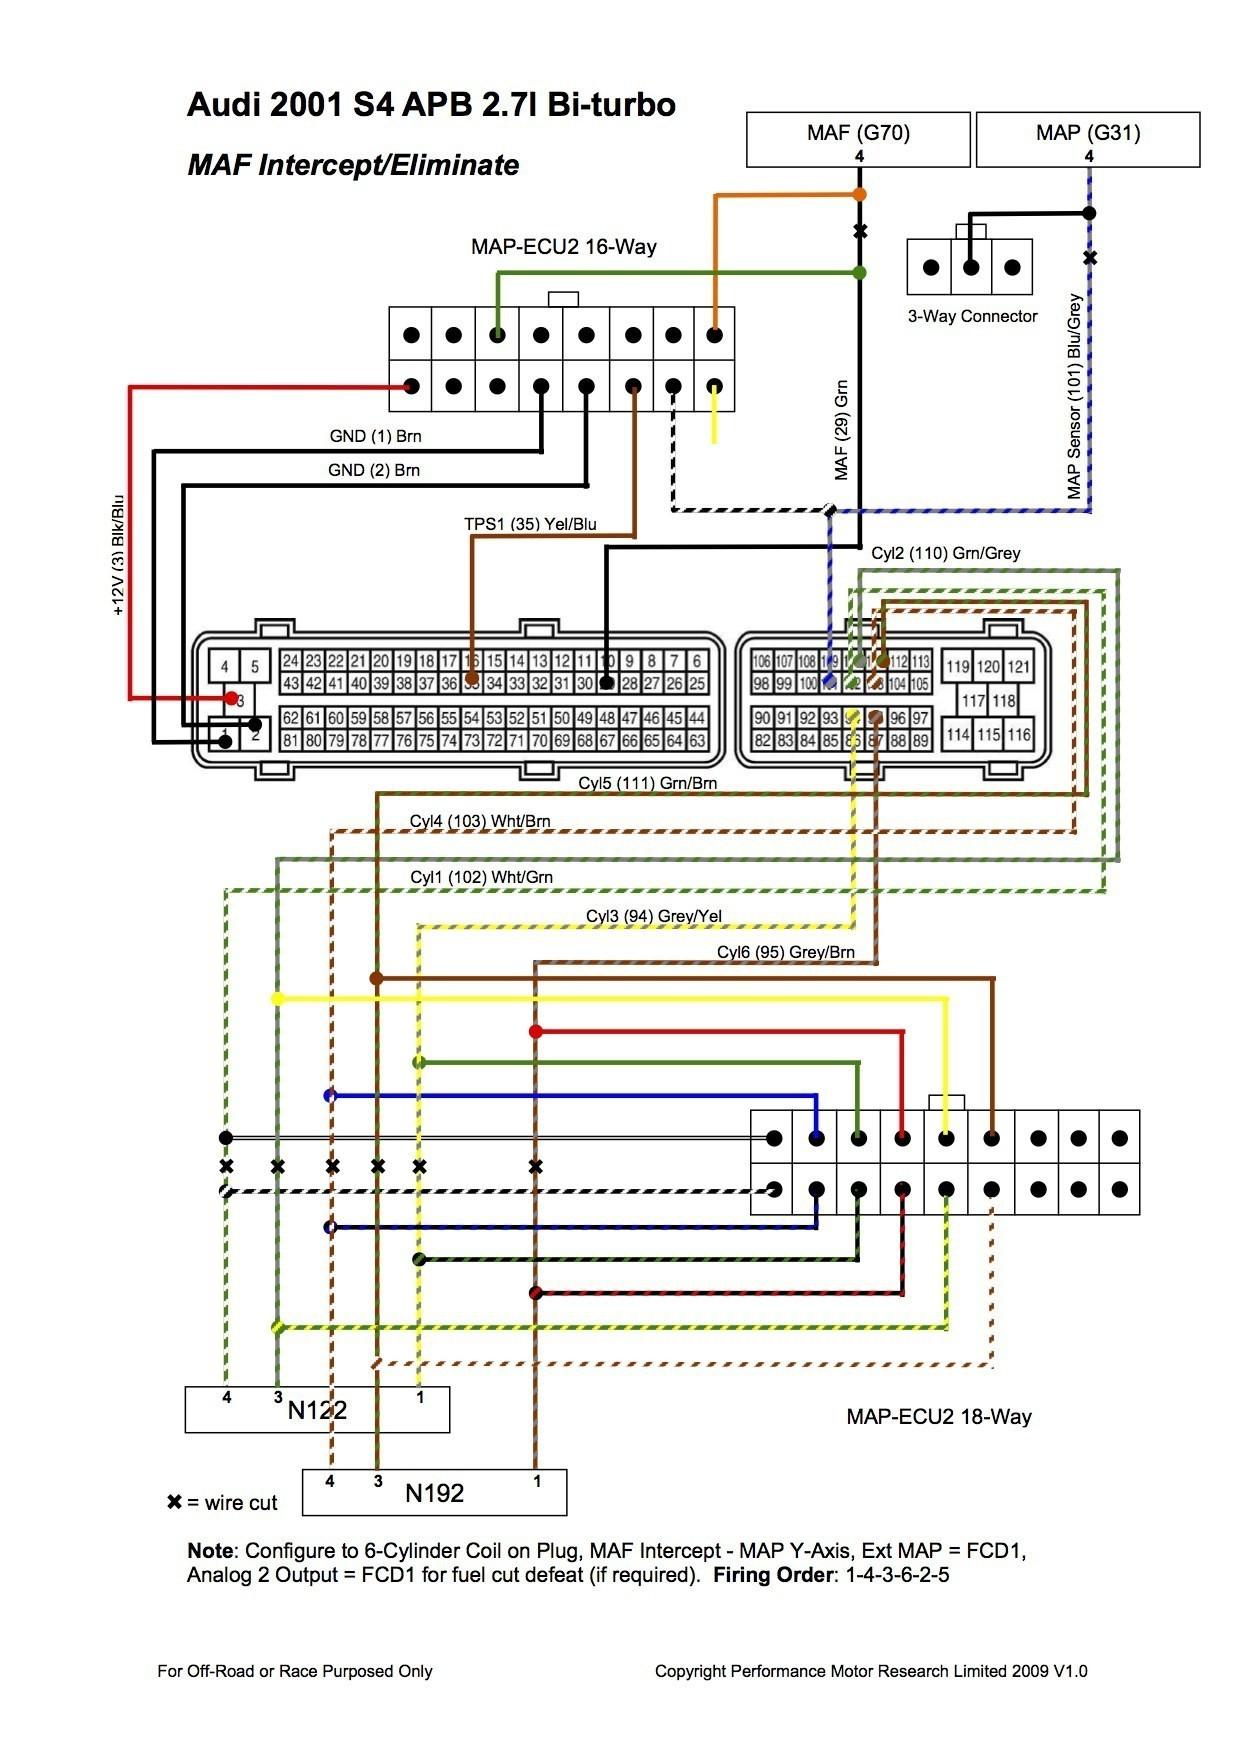 Diagram Database - Just The Best Diagram database Website   98 Avalon Wiring Diagram      sylvie.batlle.jobdiagram.hosteria87.it